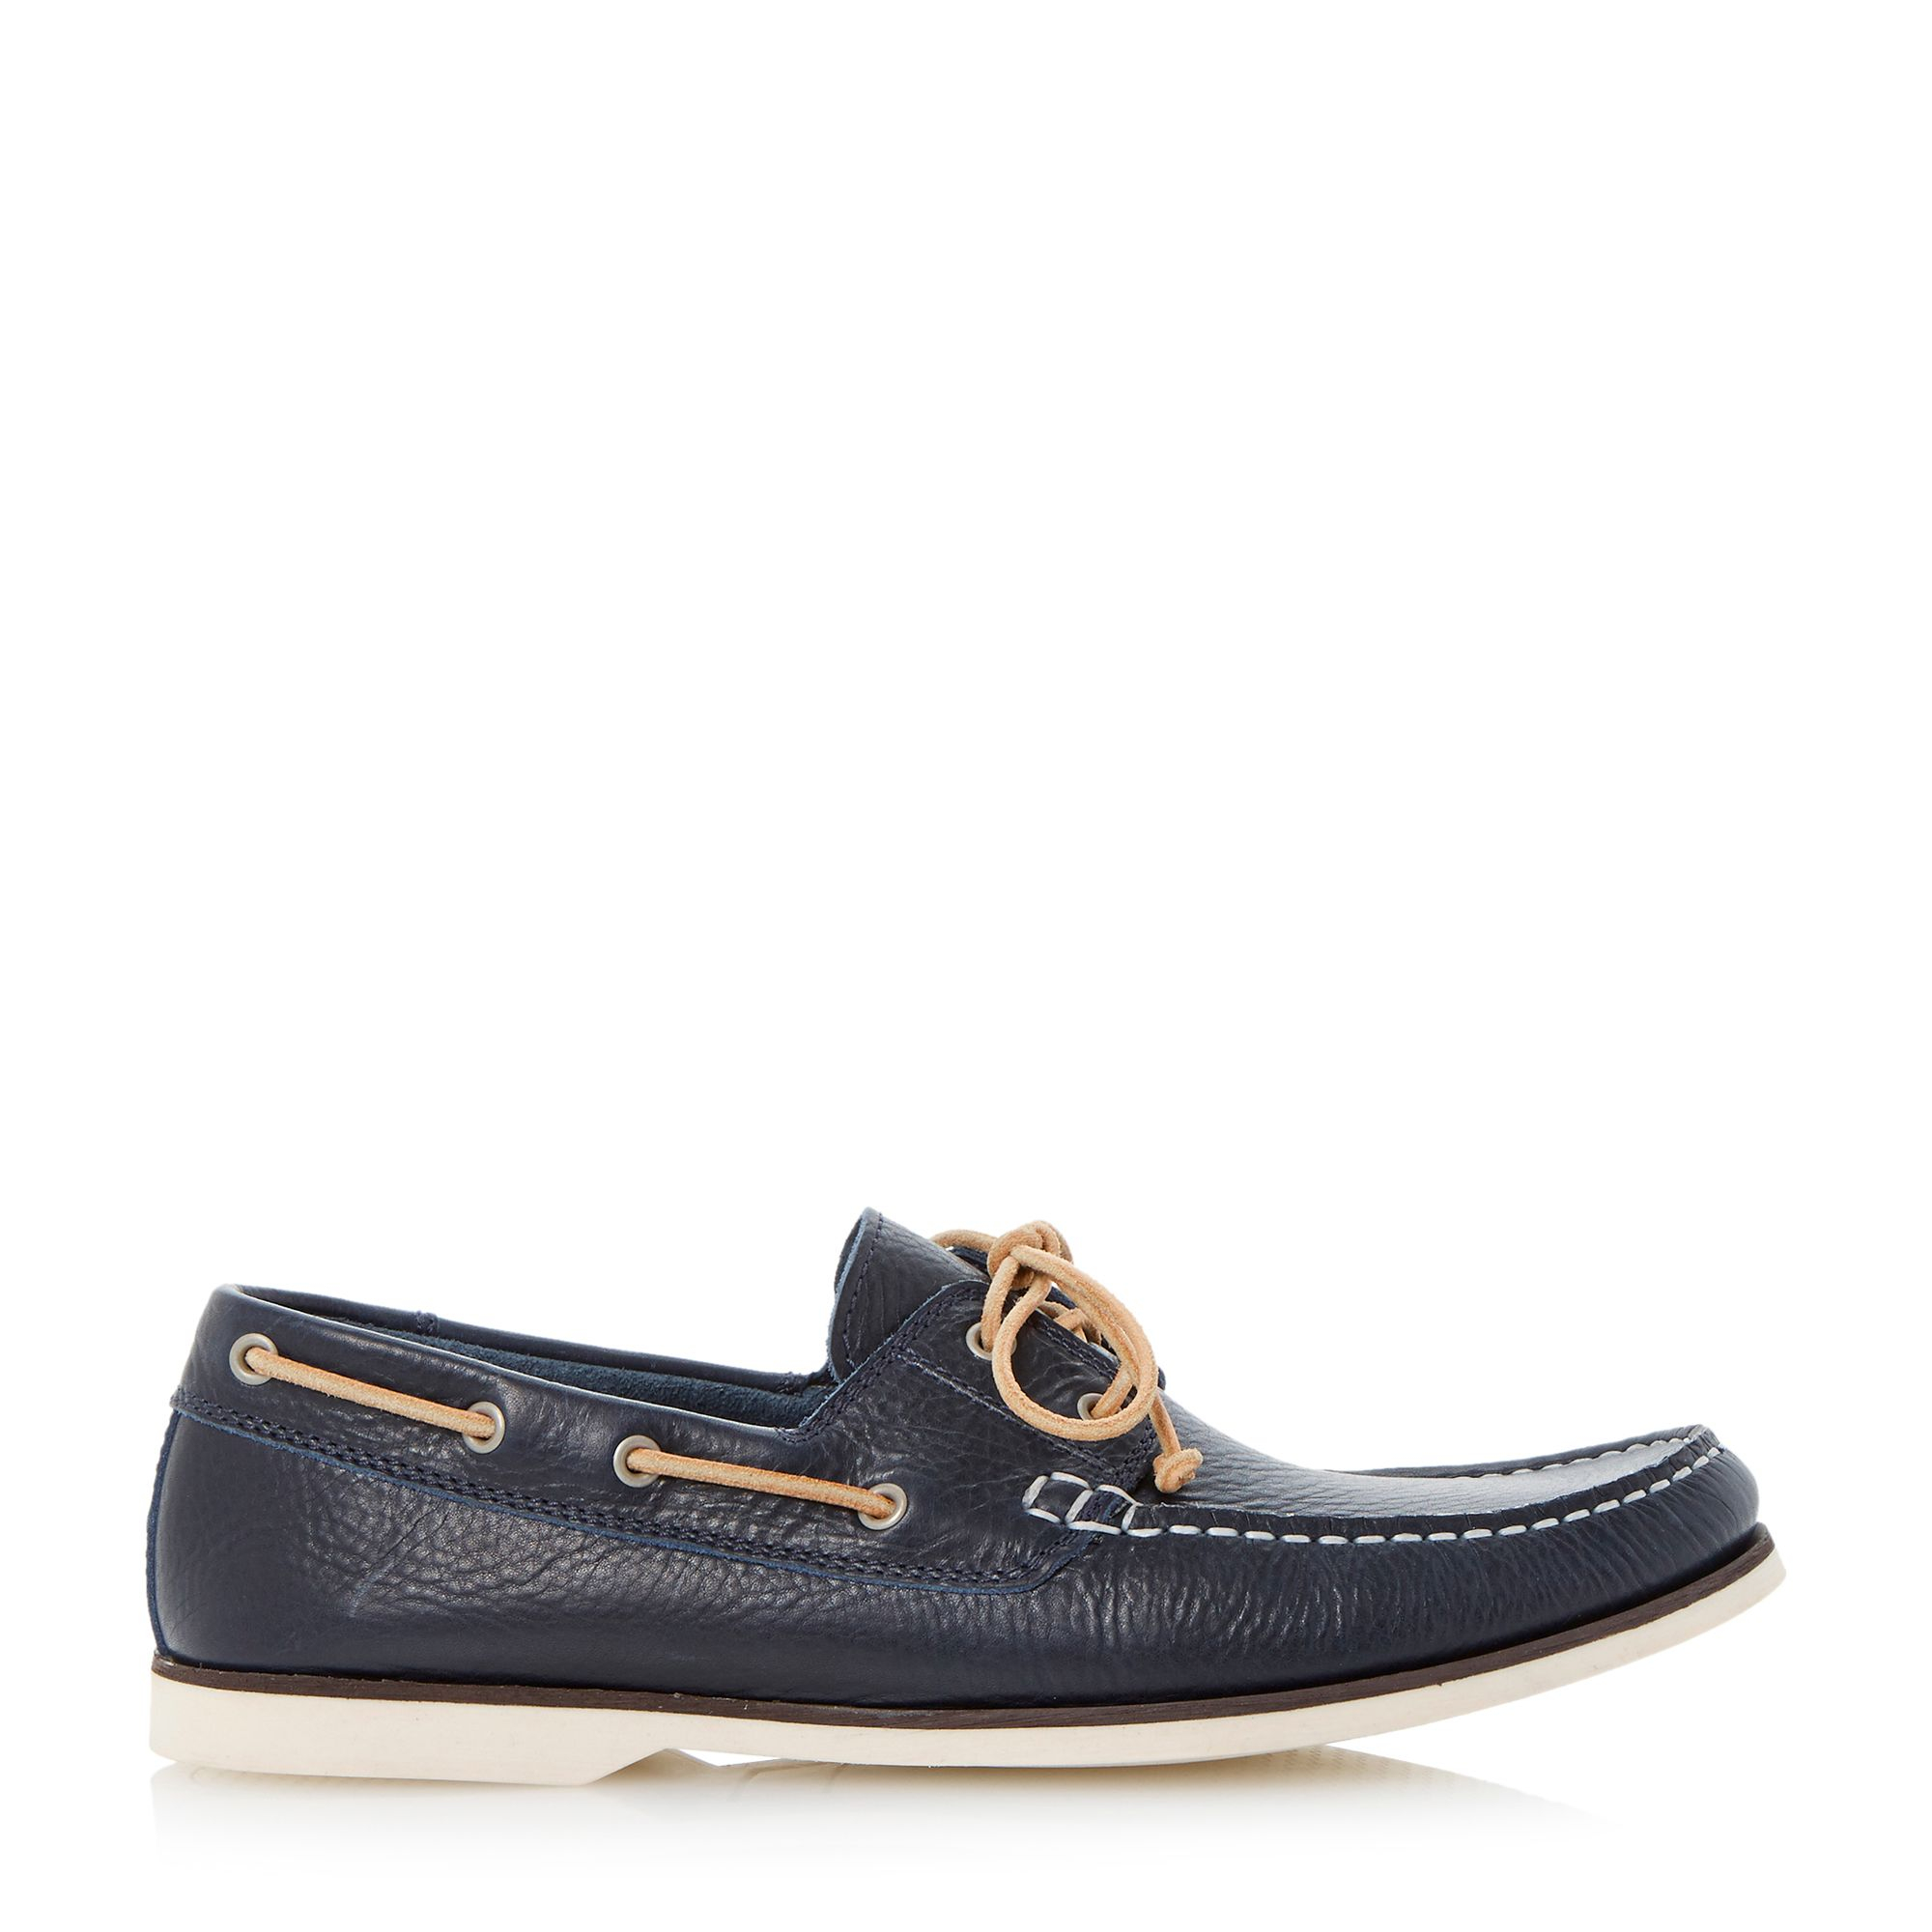 bertie battleship slip on casual boat shoes in black for